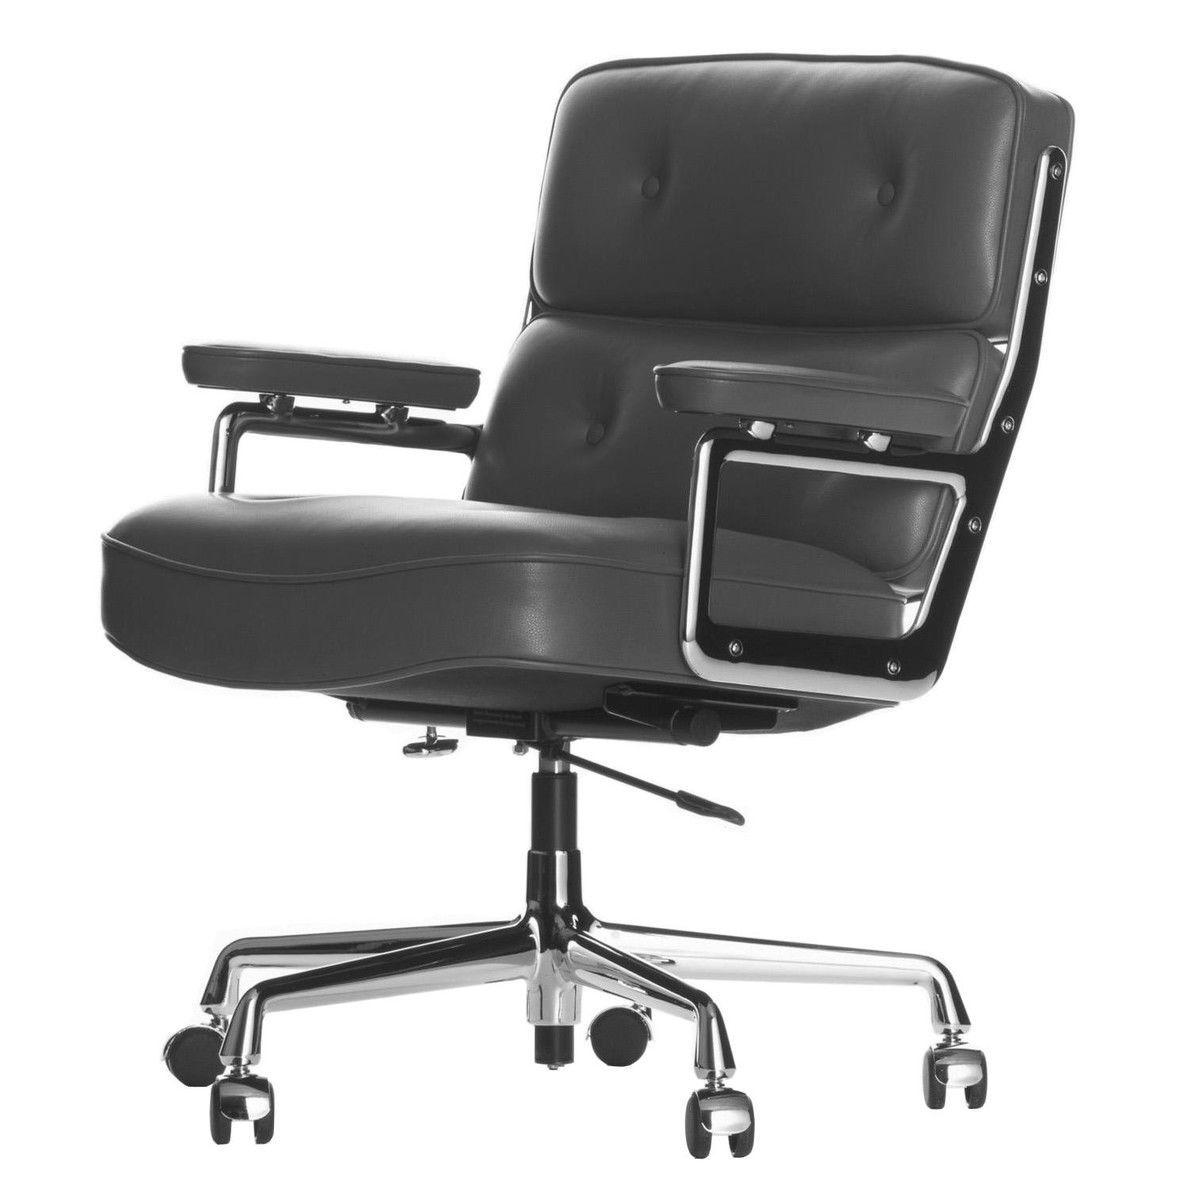 Vitra es 104 eames lobby chair bureaustoel vitra for Charles eames bureaustoel